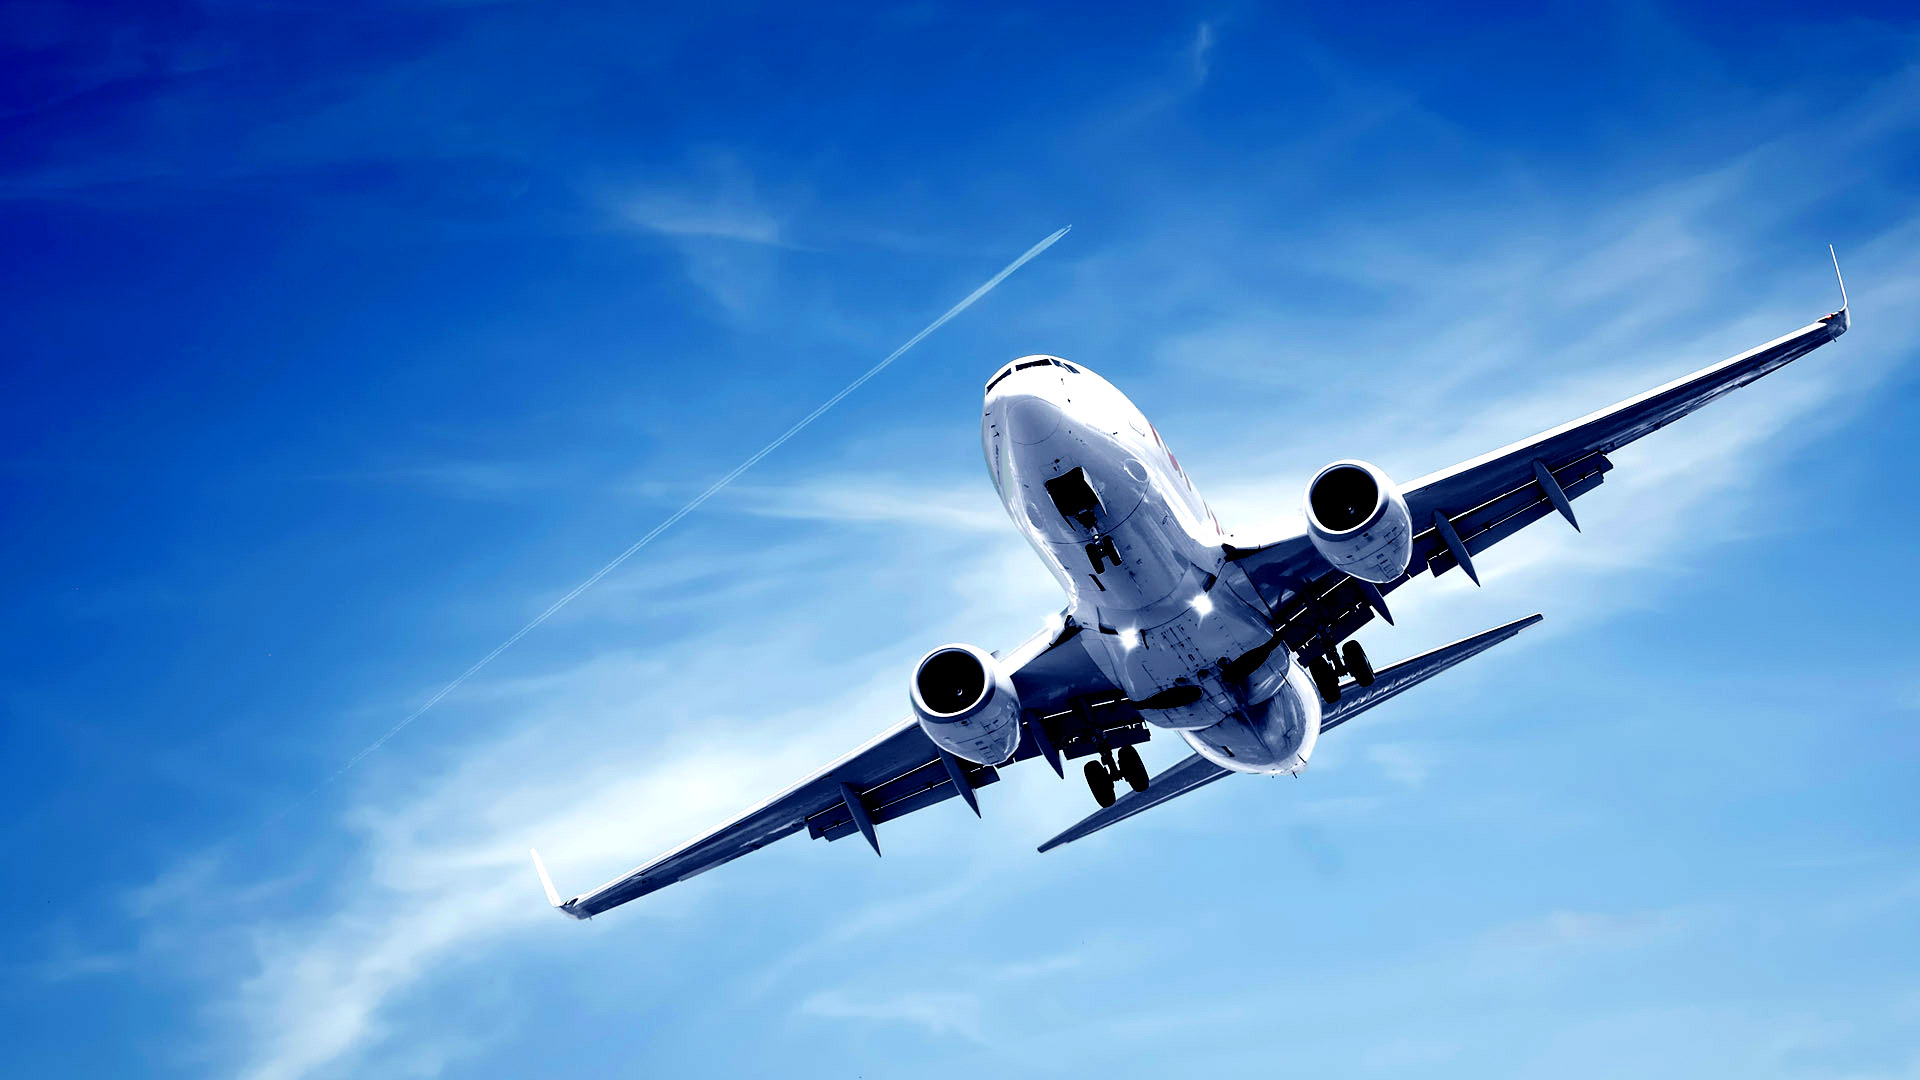 боинг, самолет, пассажирский